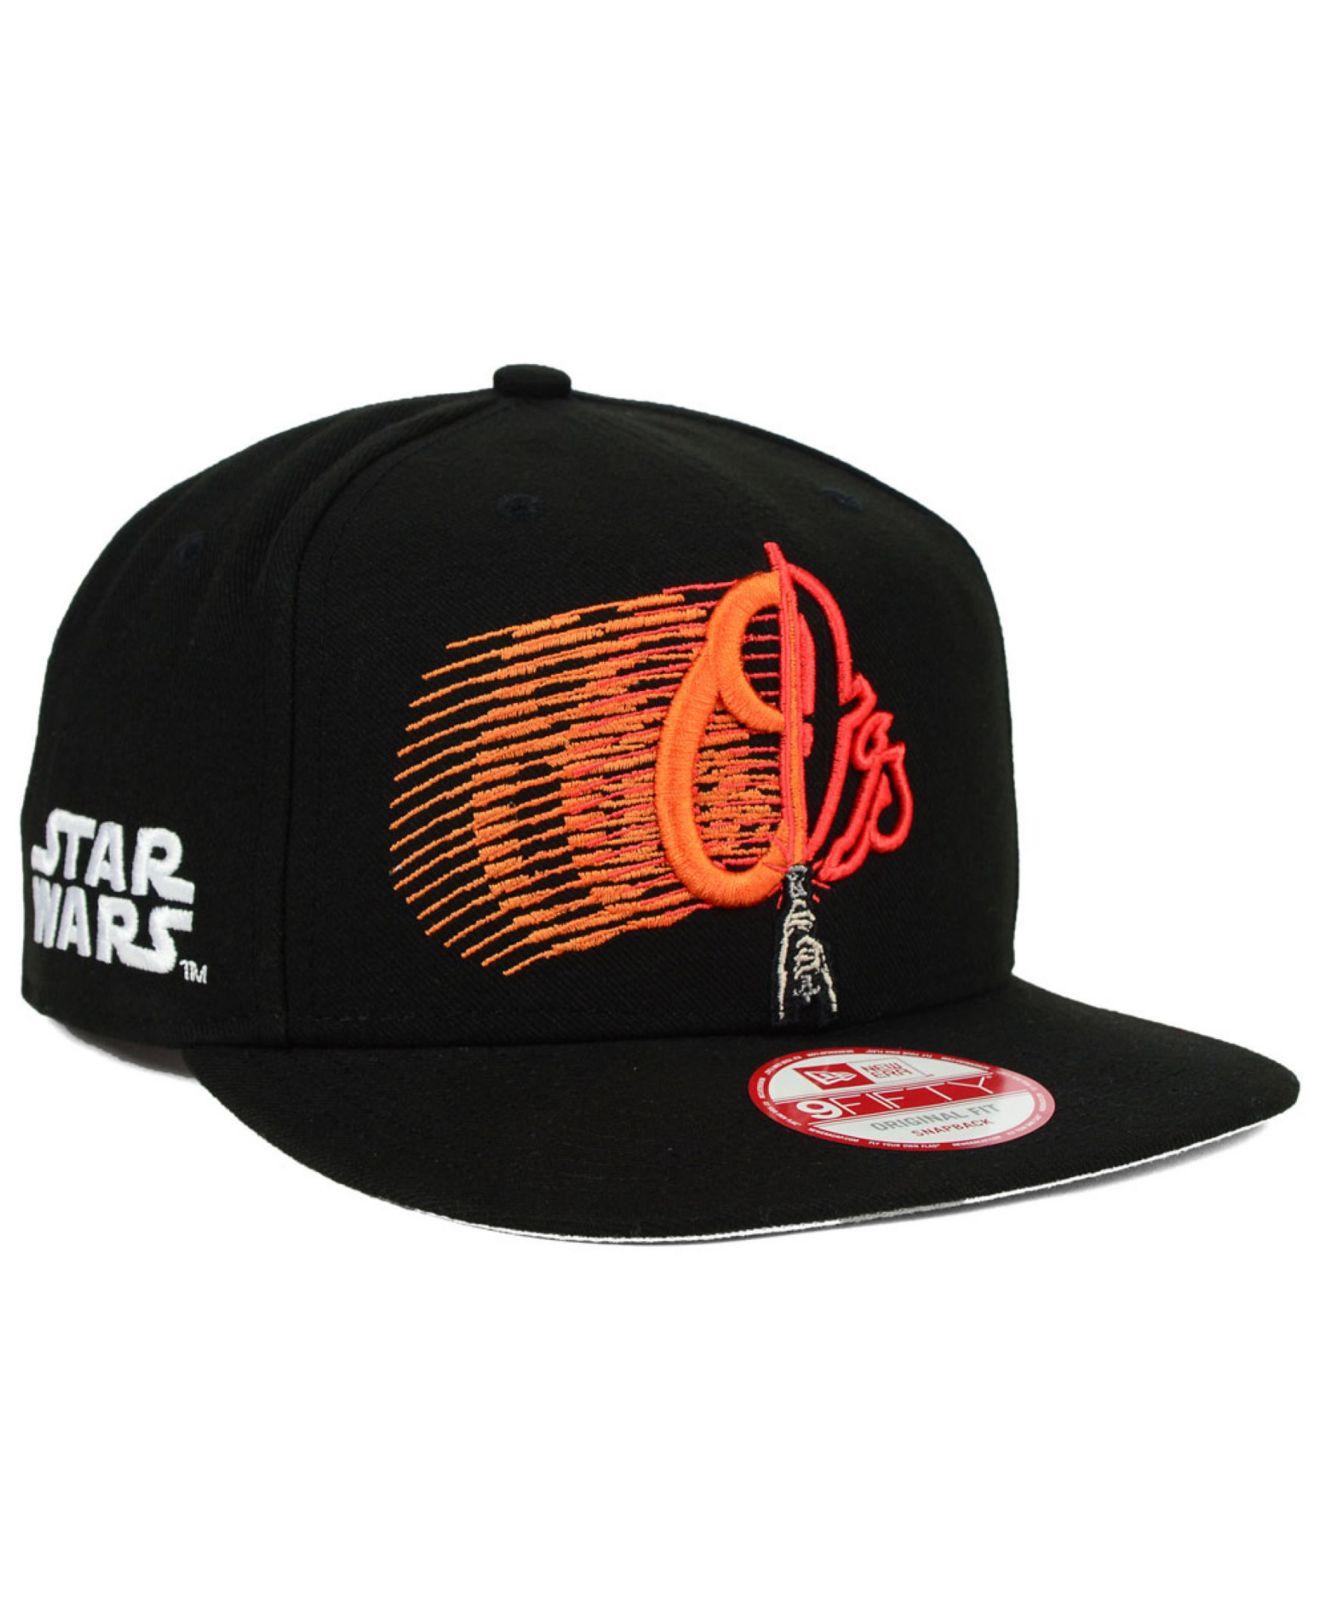 best loved 1fa16 9dafd KTZ Baltimore Orioles Star Wars Logoswipe 9fifty Snapback Cap in ...